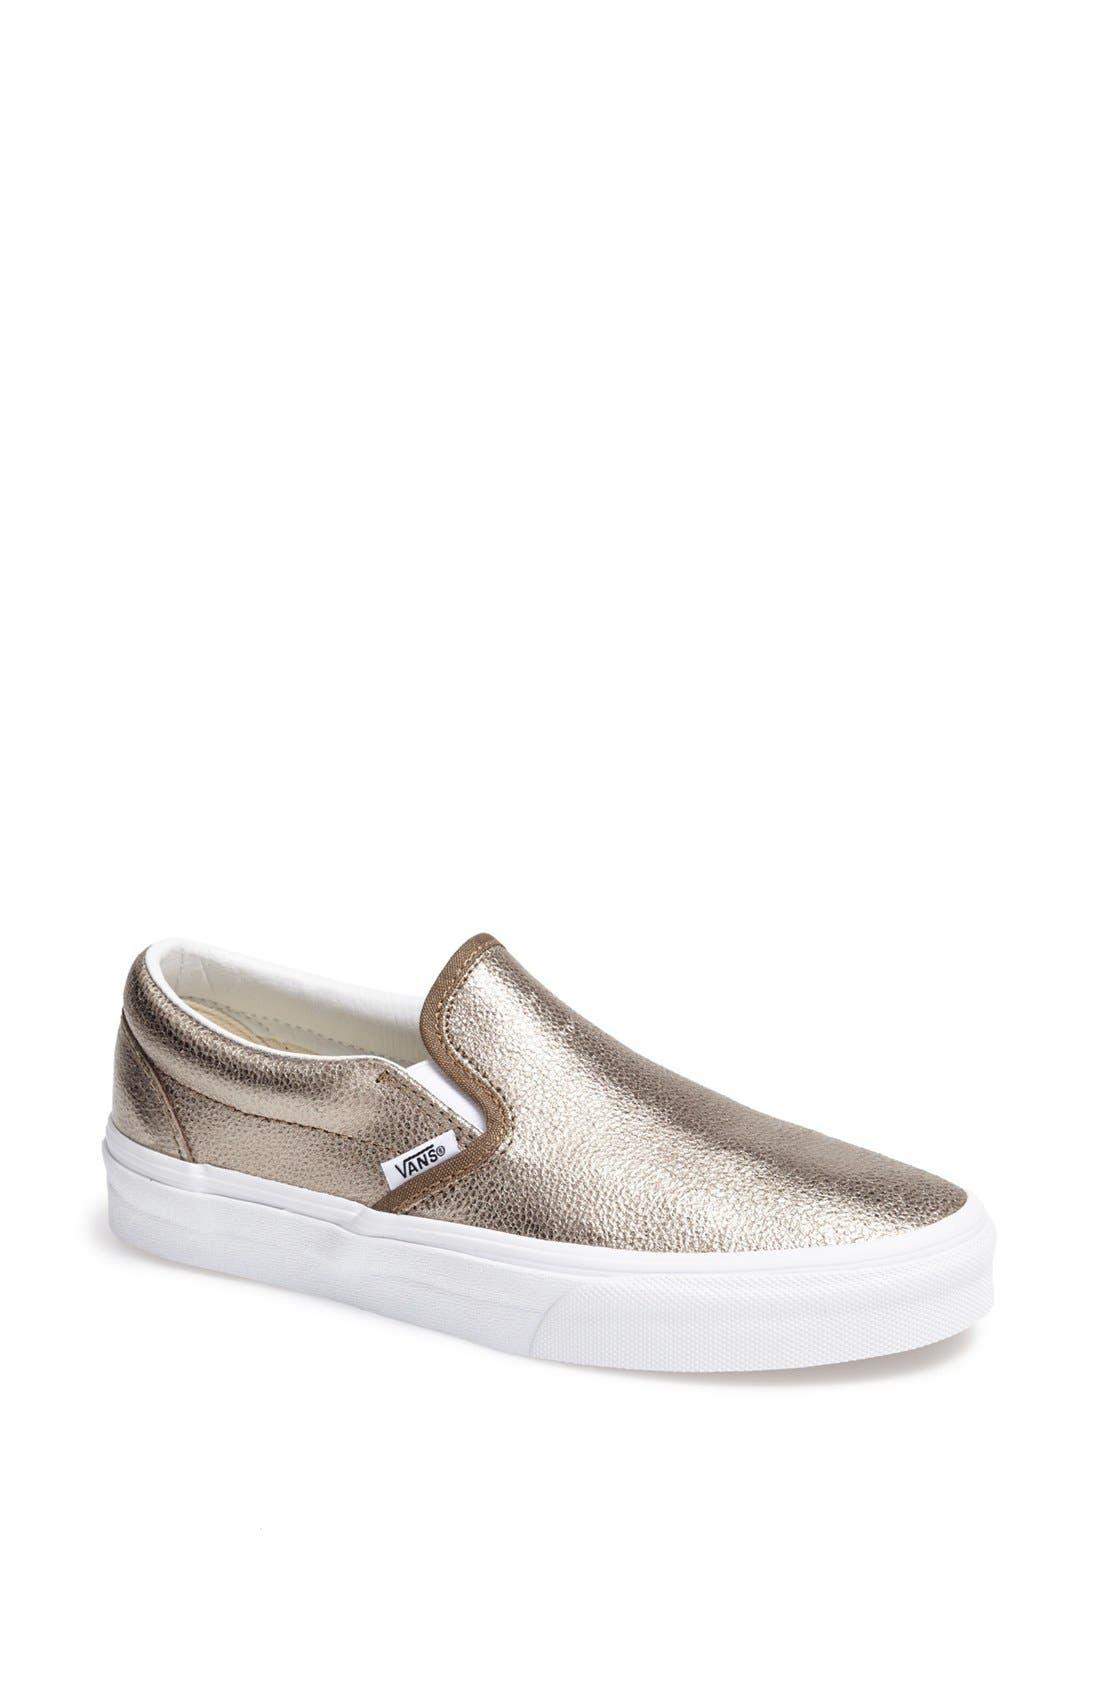 Main Image - Vans Metallic Slip-On Sneaker (Women)